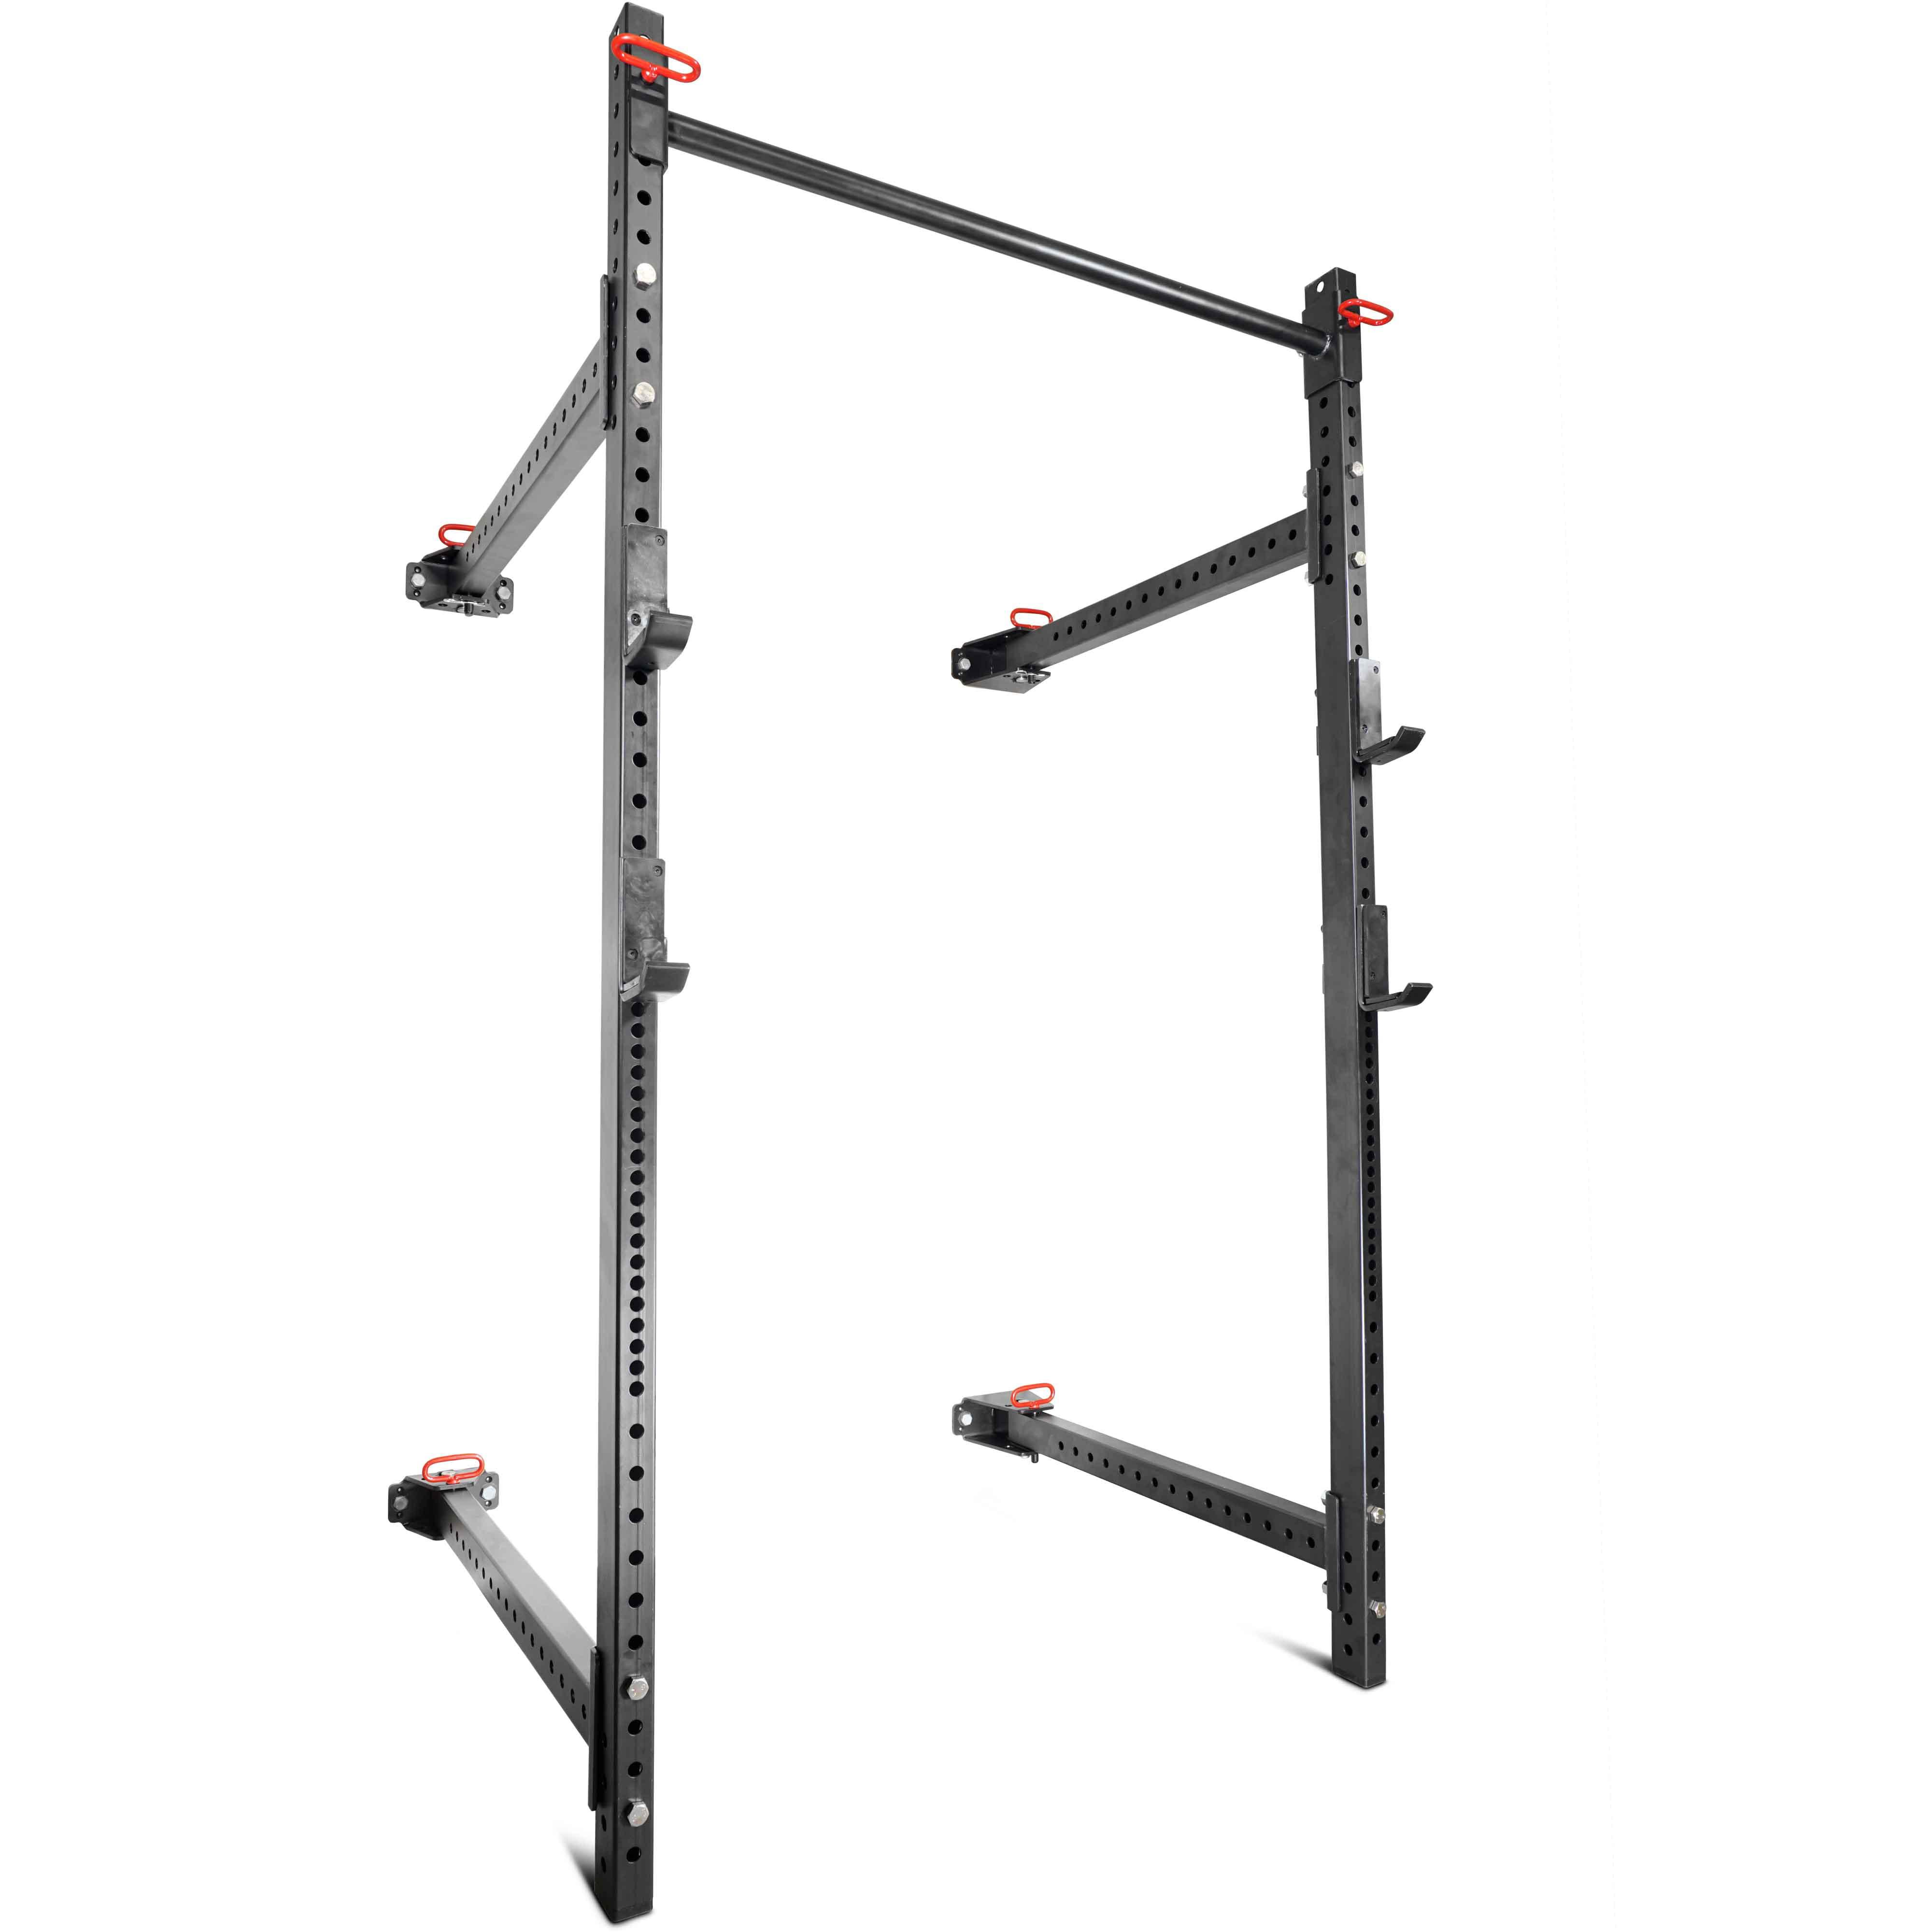 "Titan Fitness T-3 Series Fold Back Power Rack 41"" Deep Wall Mounted Laser Cut by Titan Fitness"